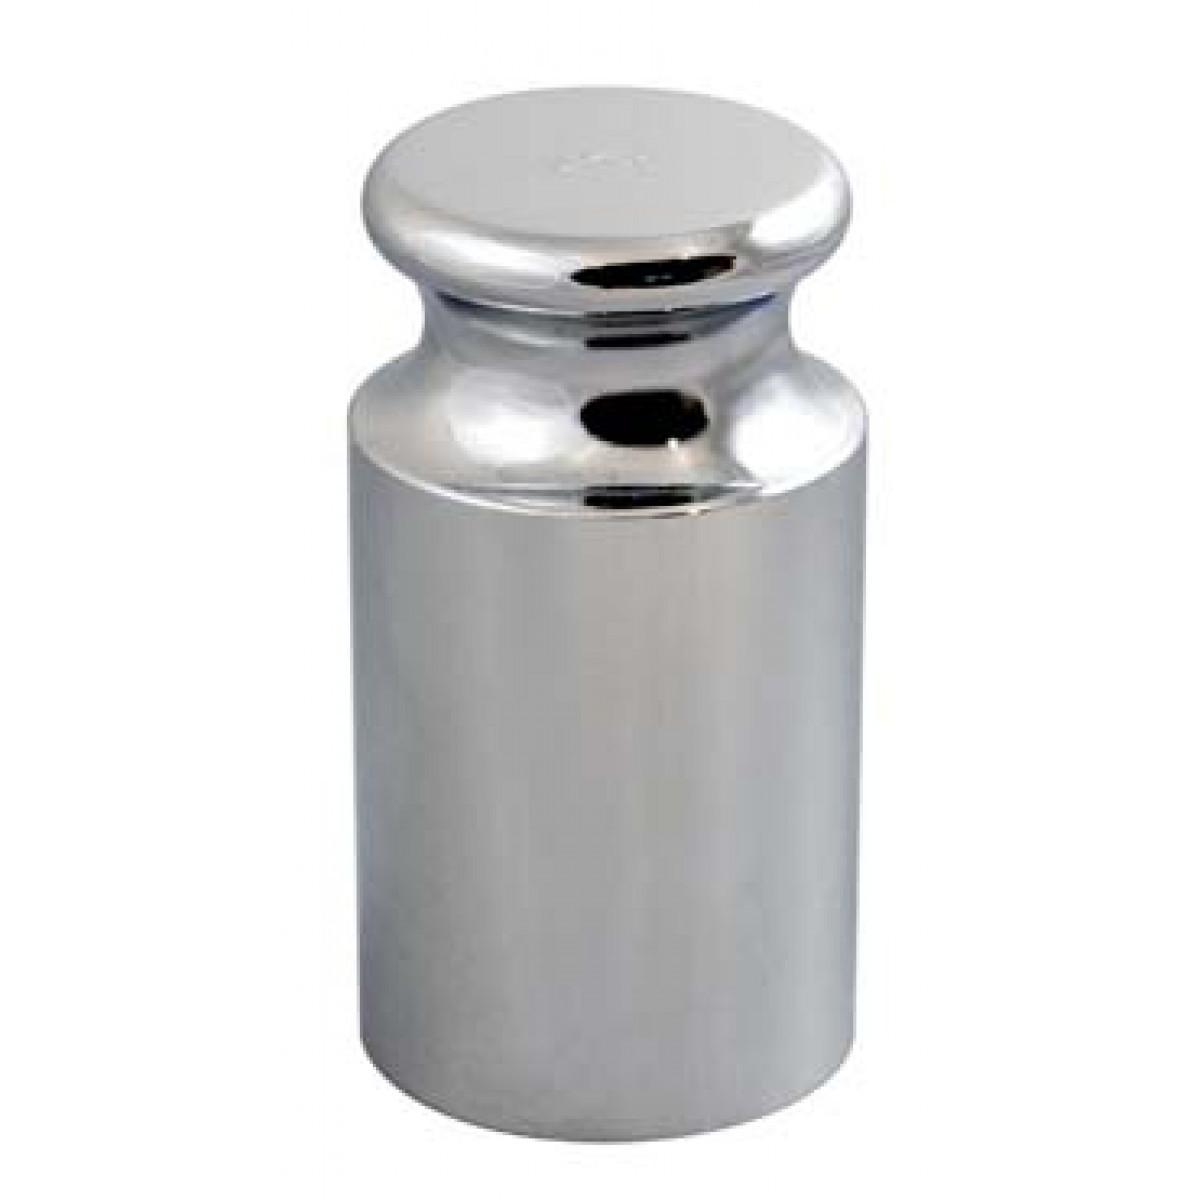 Kalibreringslod - Kapacitet 1 gr.  Standard